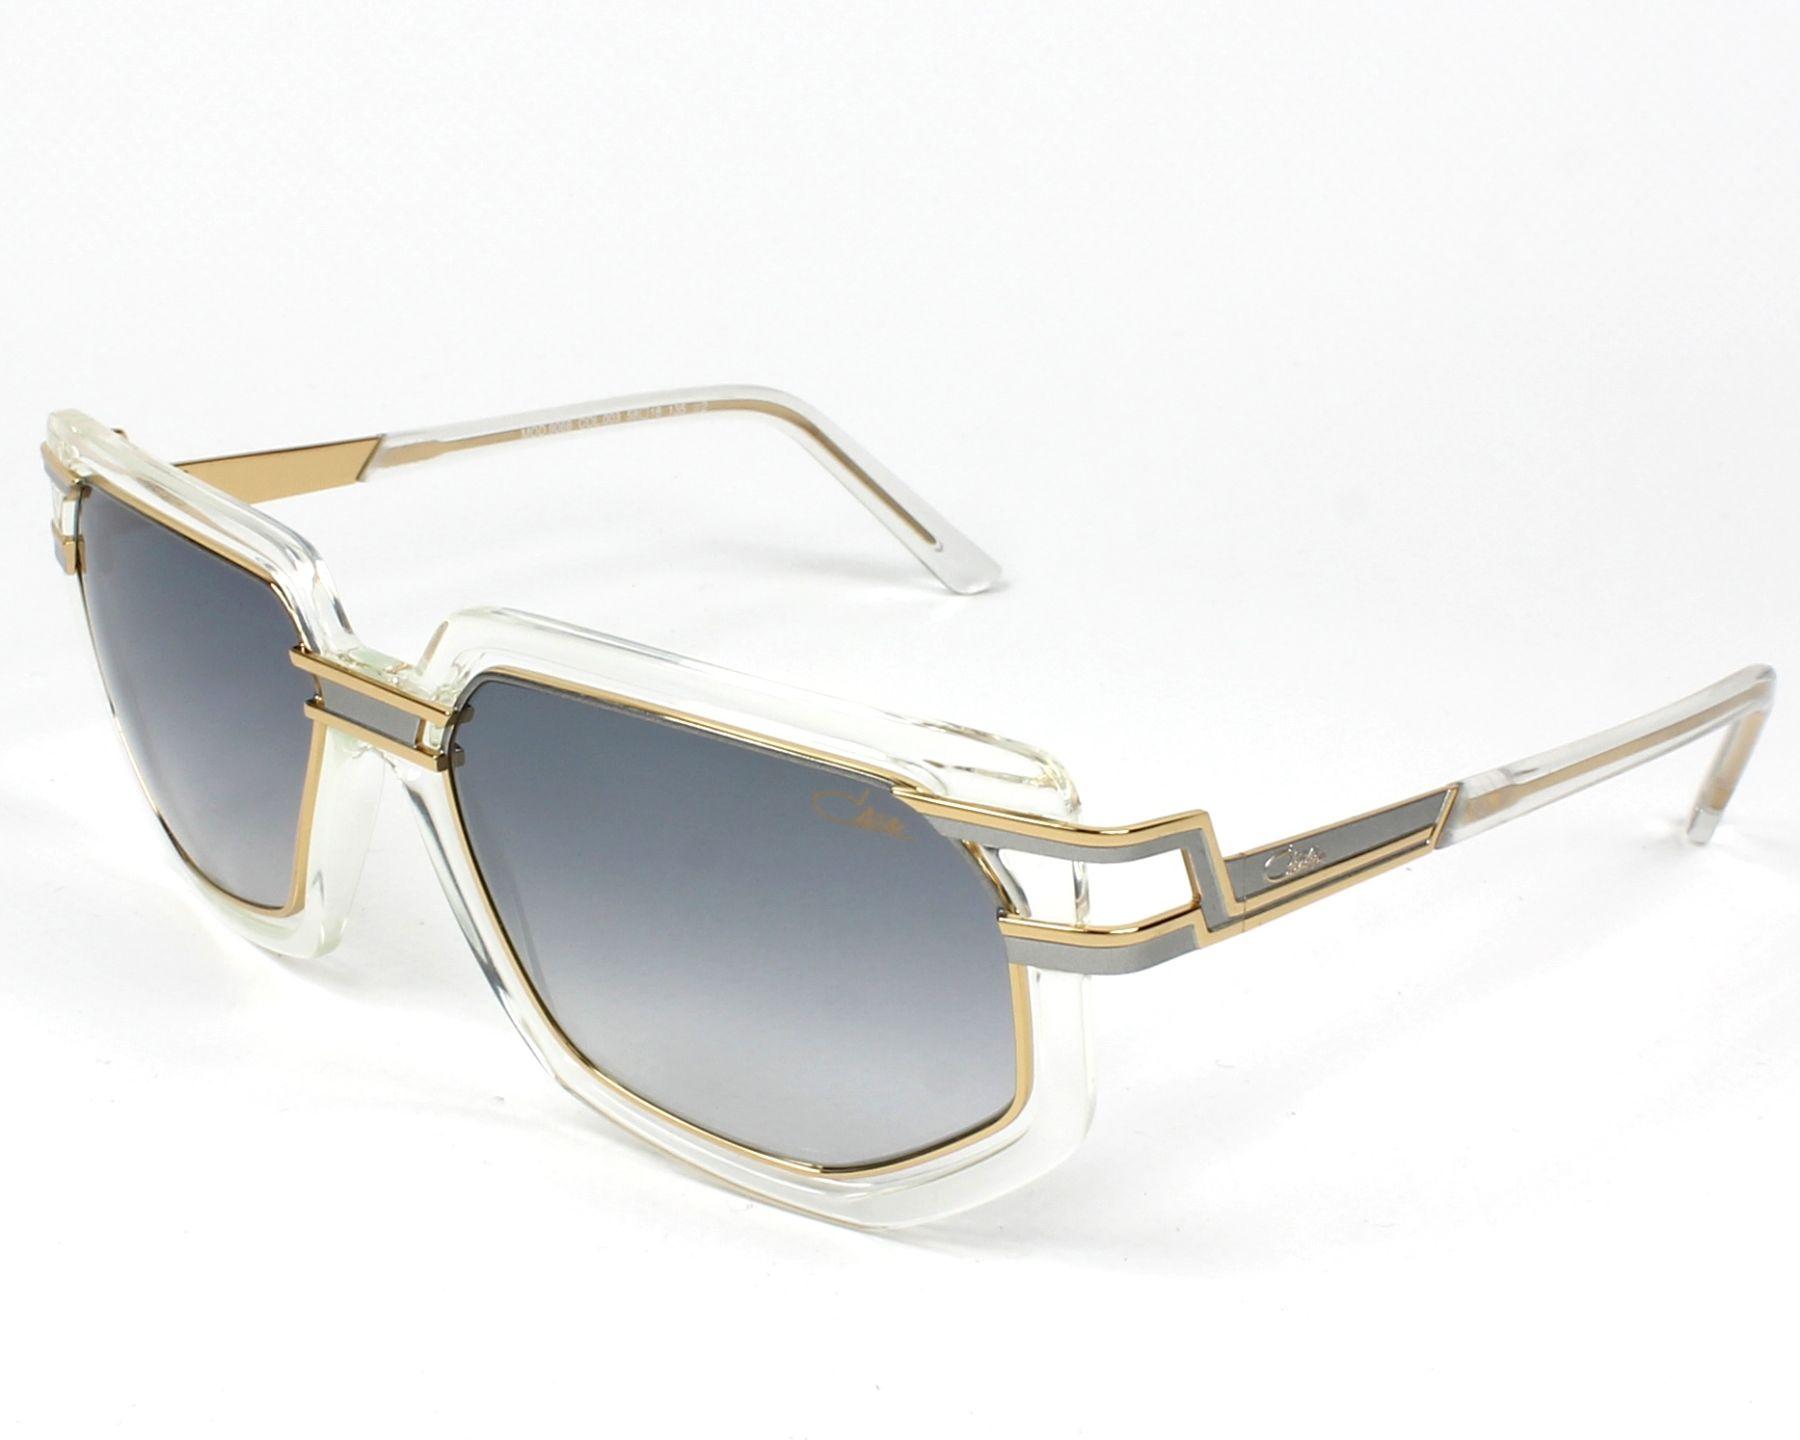 307053ac23ce Cazals Glasses